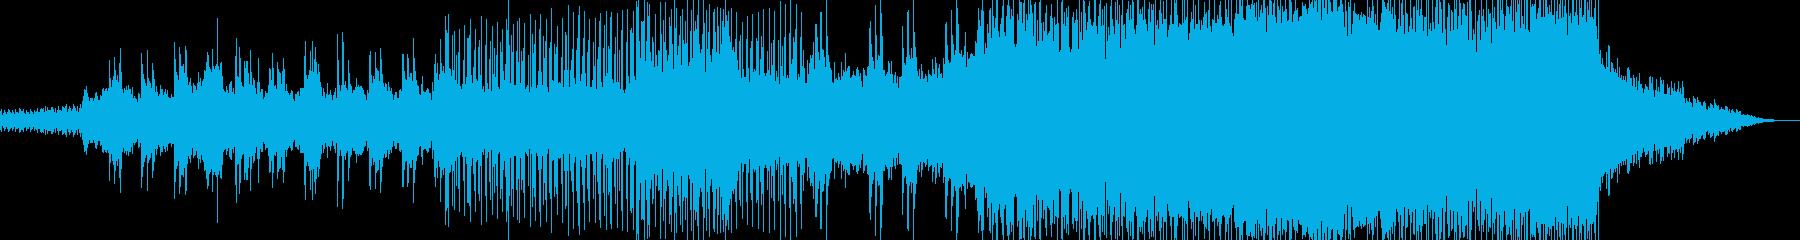 Loop of curtain fallの再生済みの波形